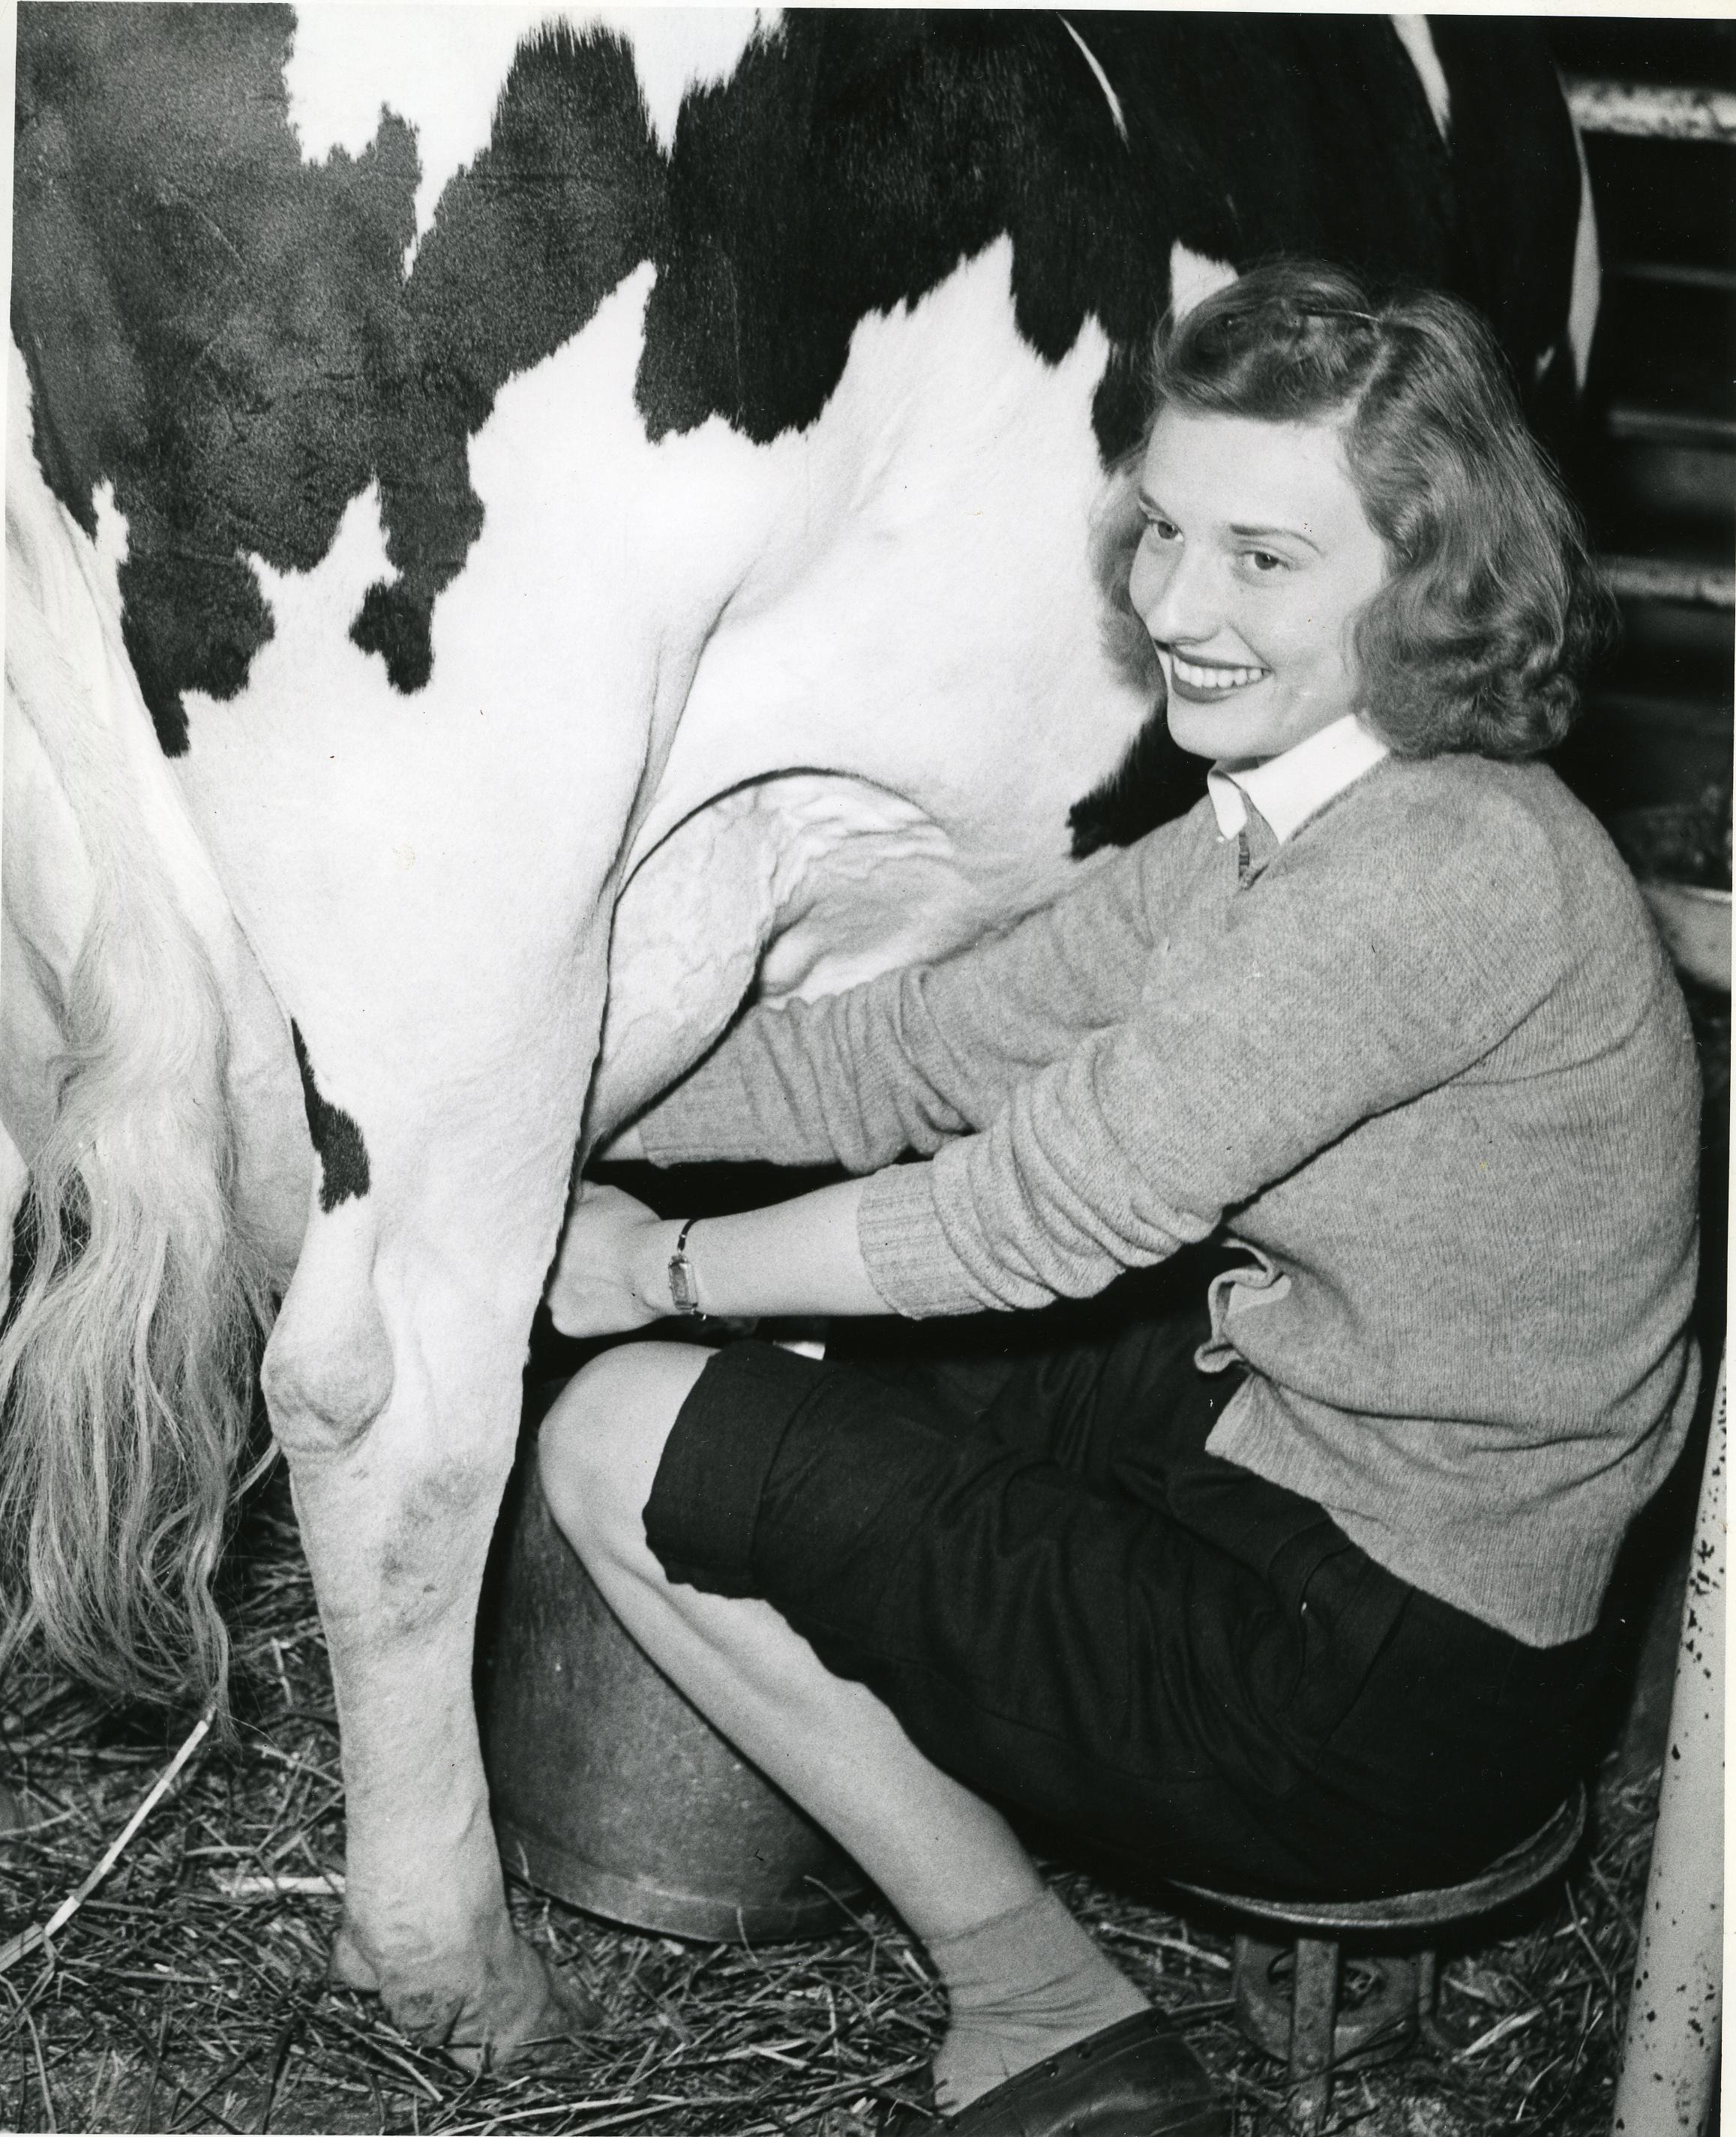 Woman milking cow, circa 1943